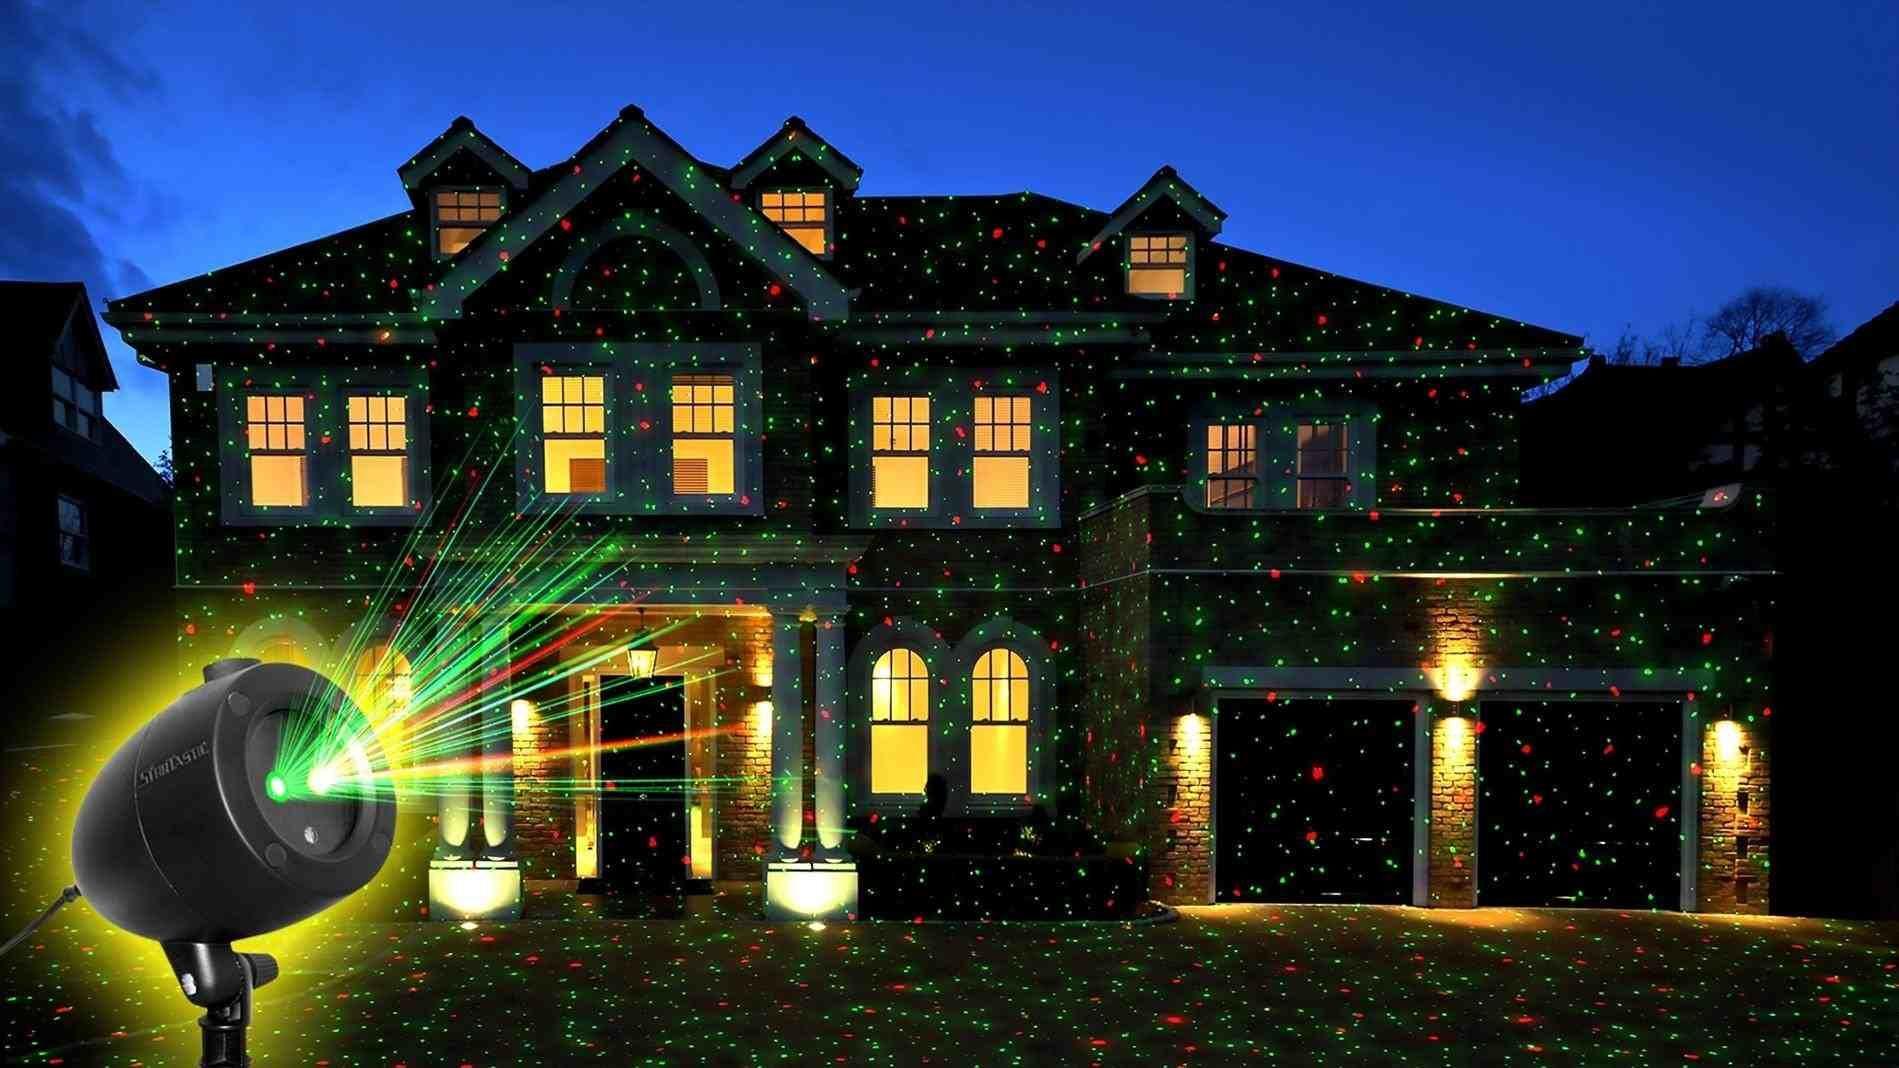 New Post Outdoor Christmas Lights Projector Interesting Visit Xmastsite